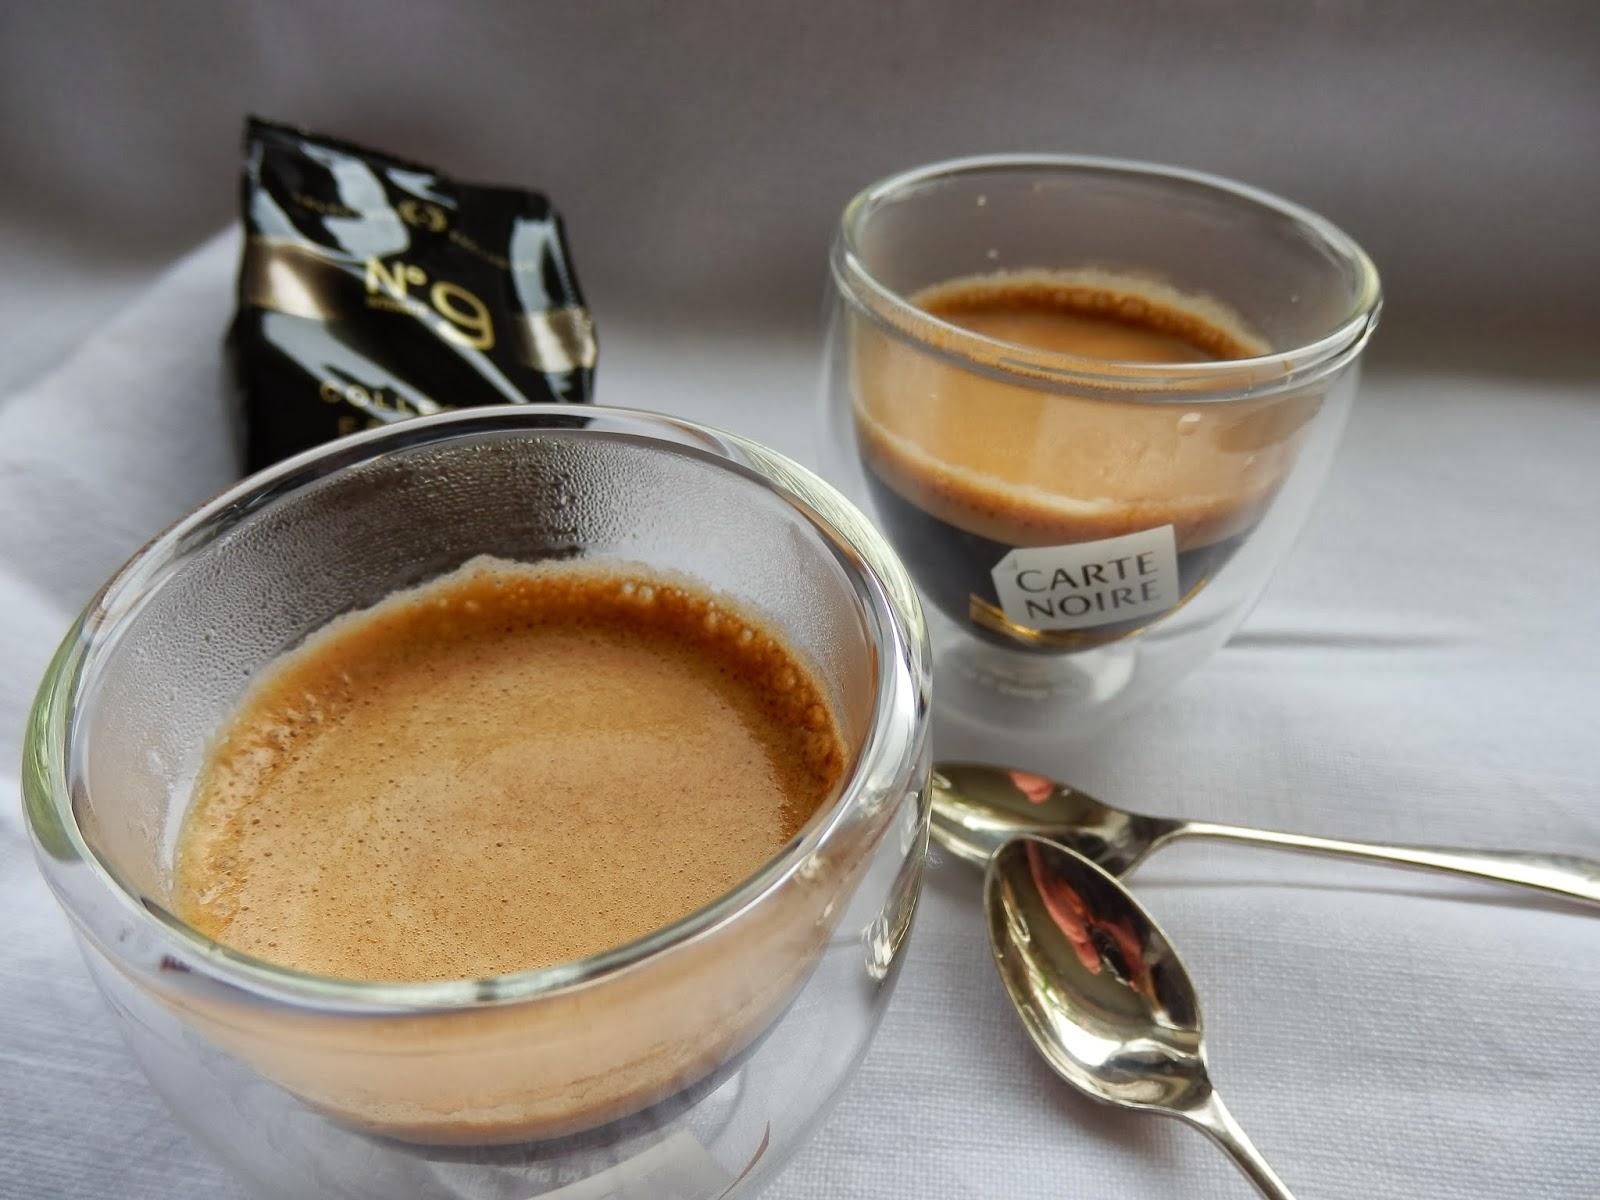 Carte Noire Espresso